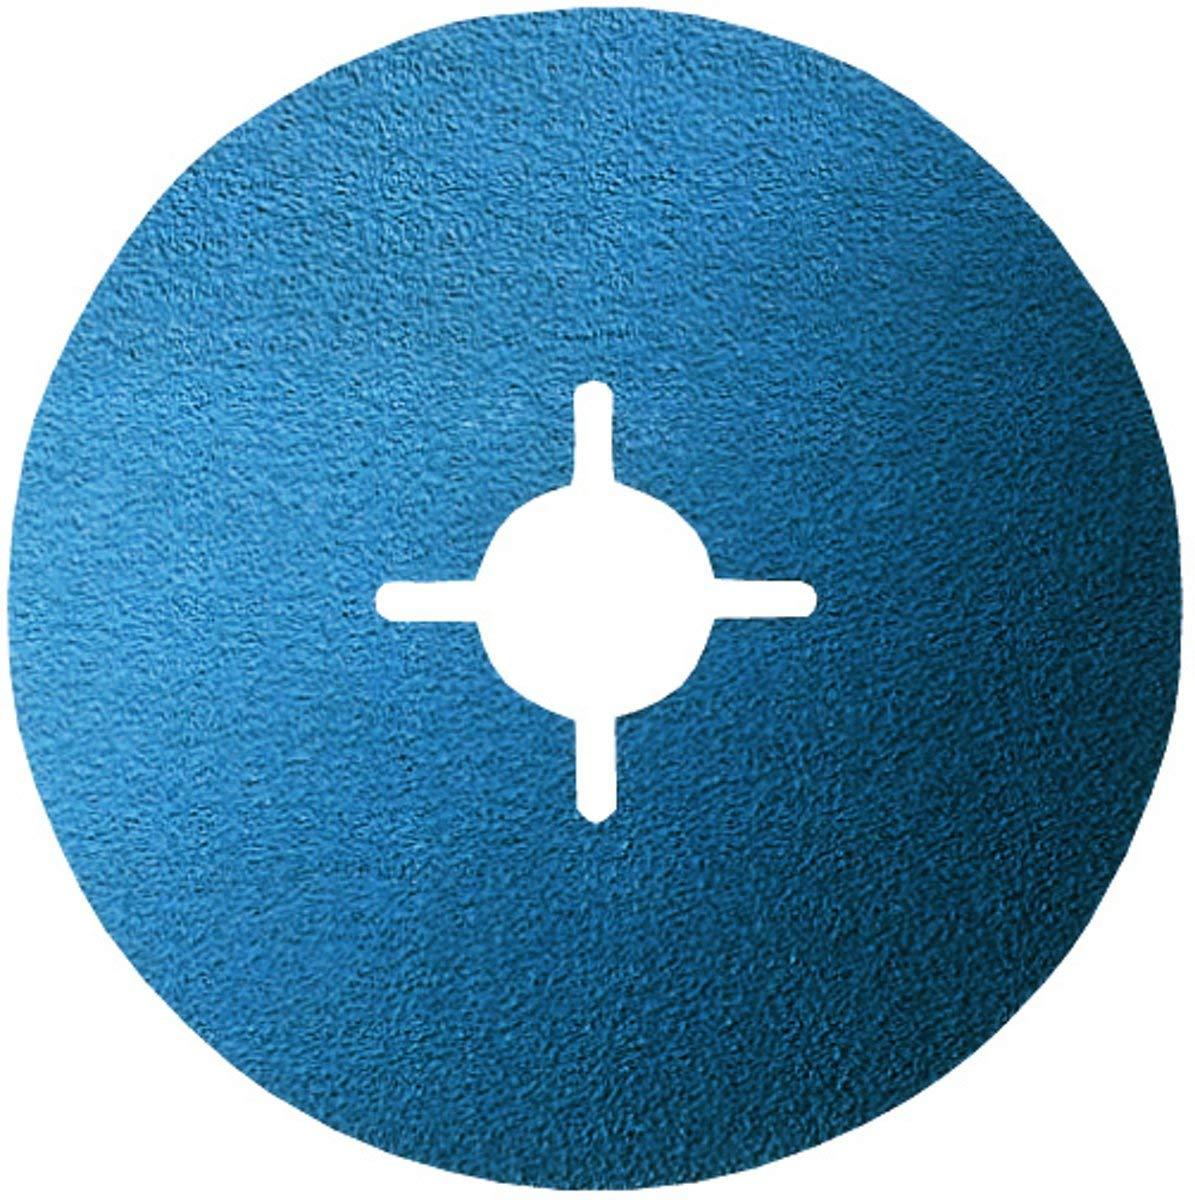 f/ür Winkelschleifer verschiedene Materialien, /Ø 230 mm, K/örnung 80 Bosch DIY Fiberschleifscheibe